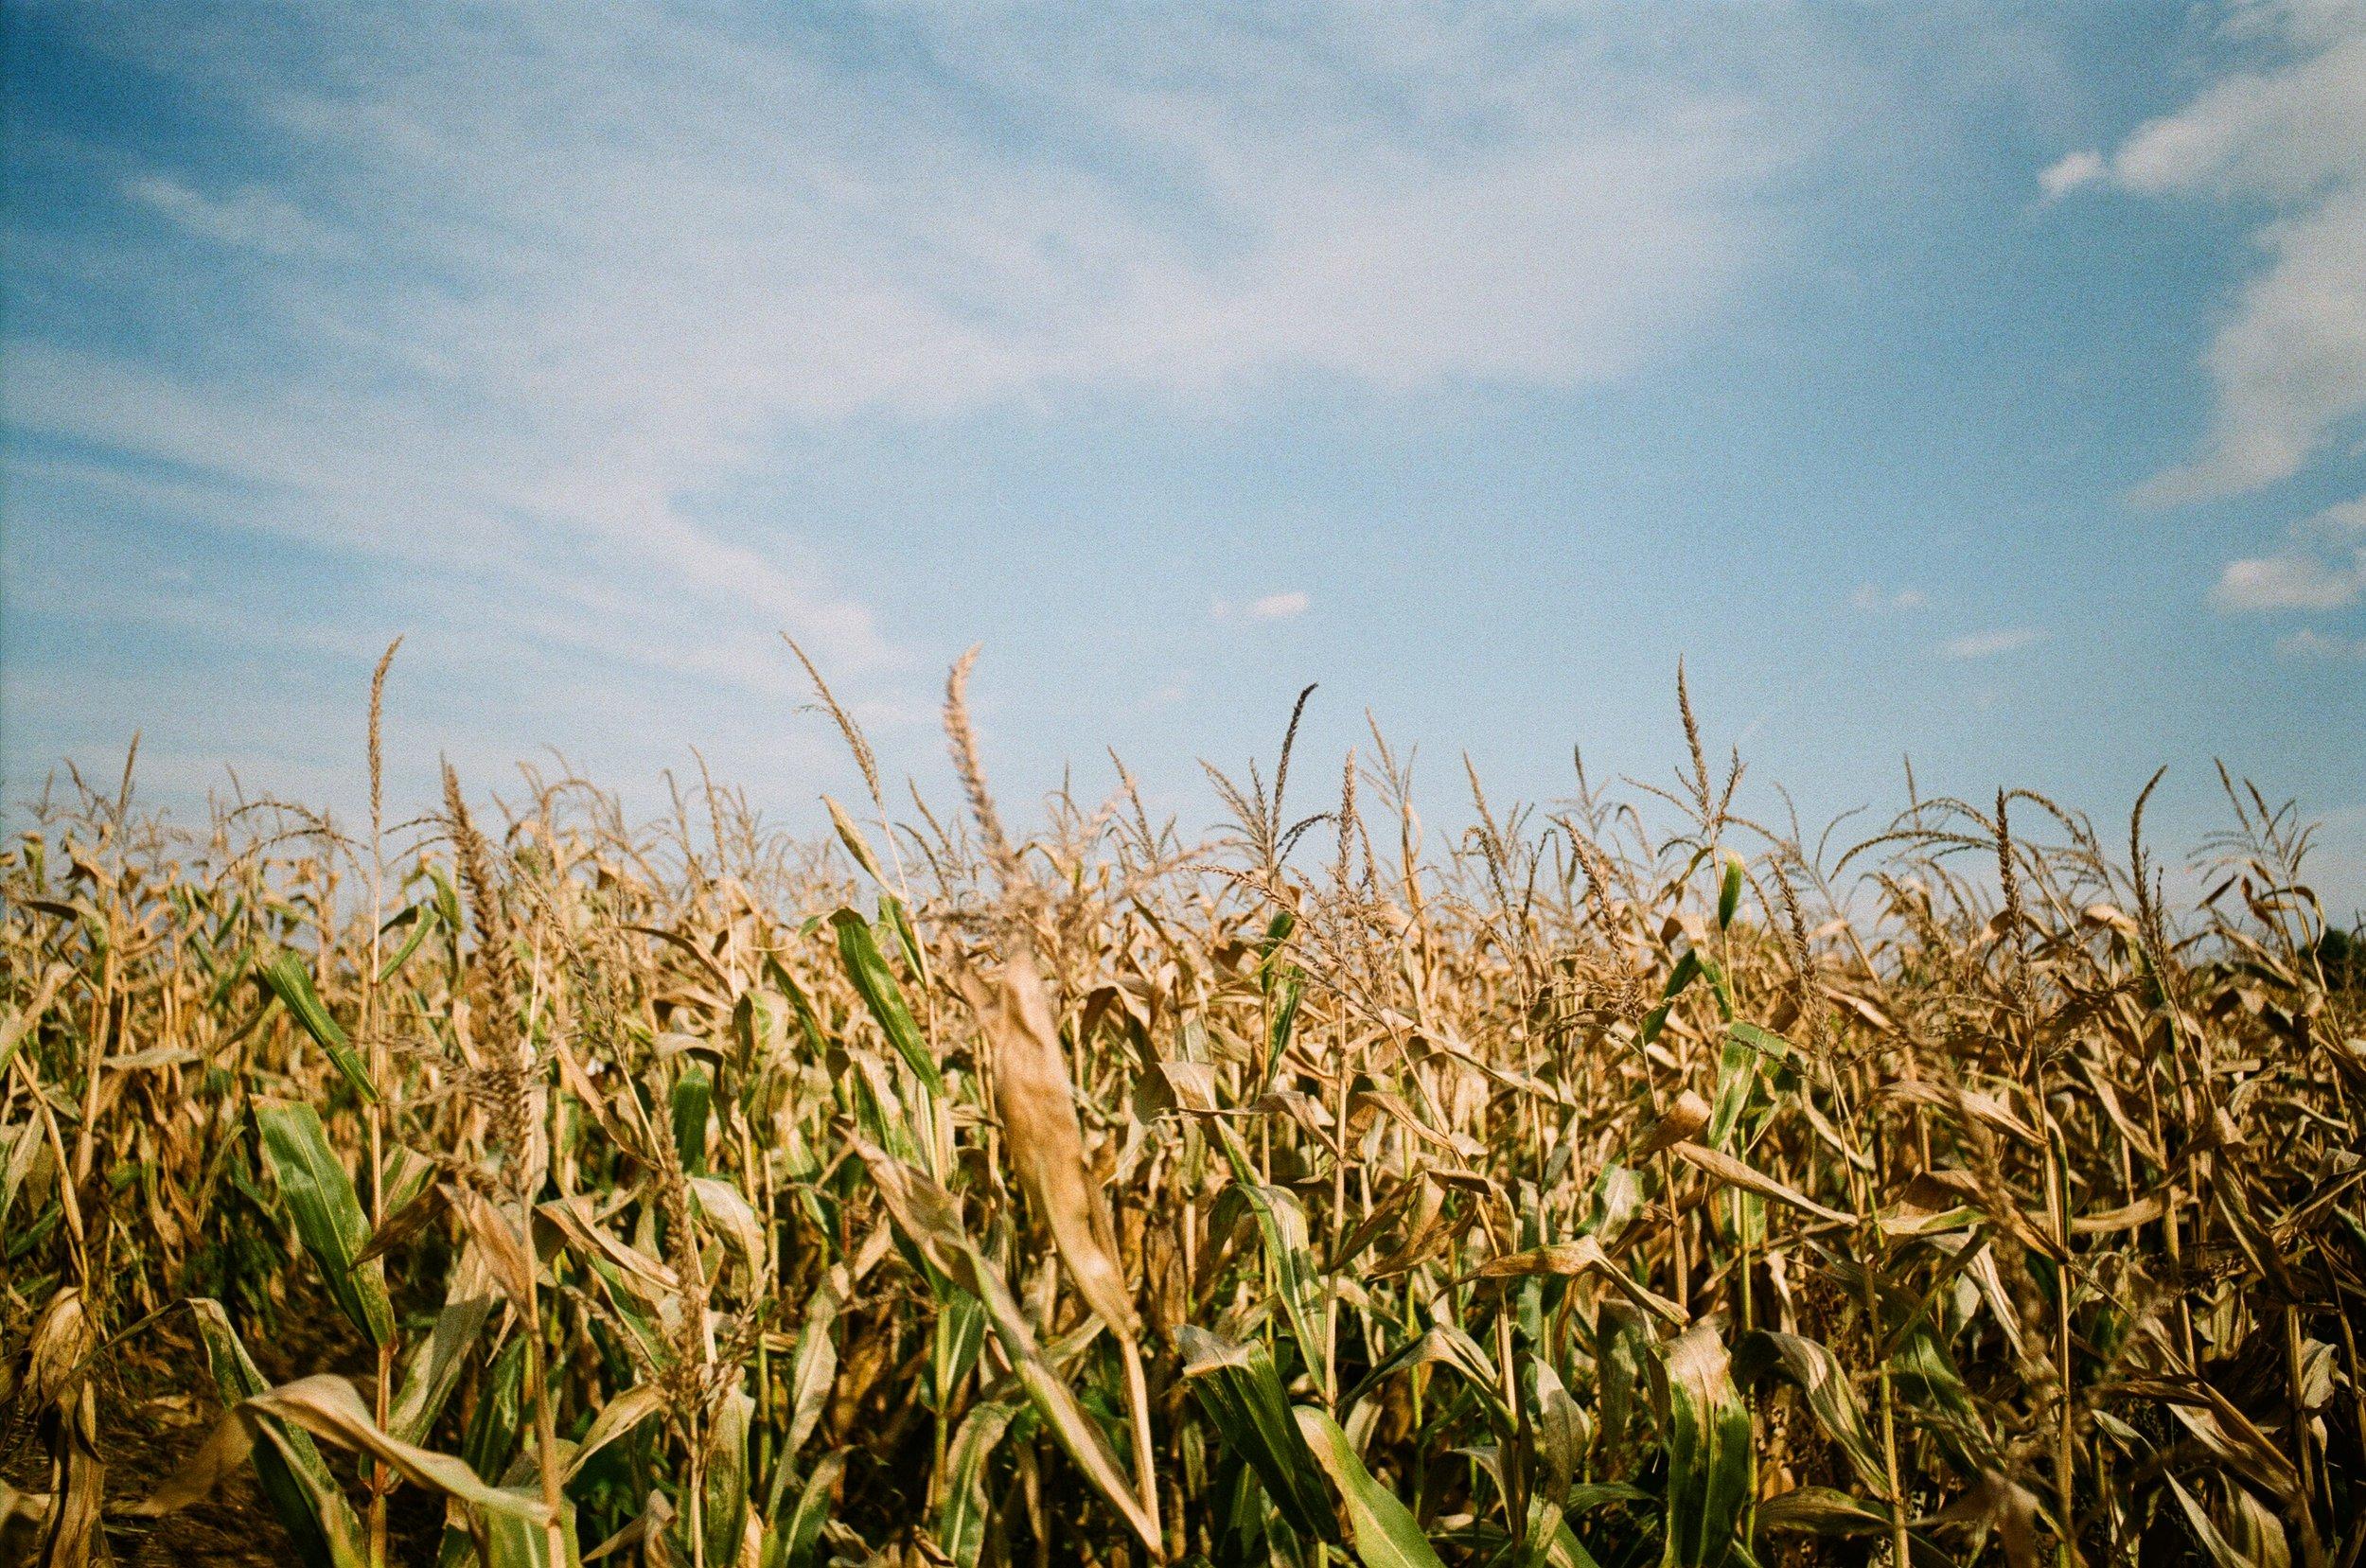 Wheat_and_sky.jpg